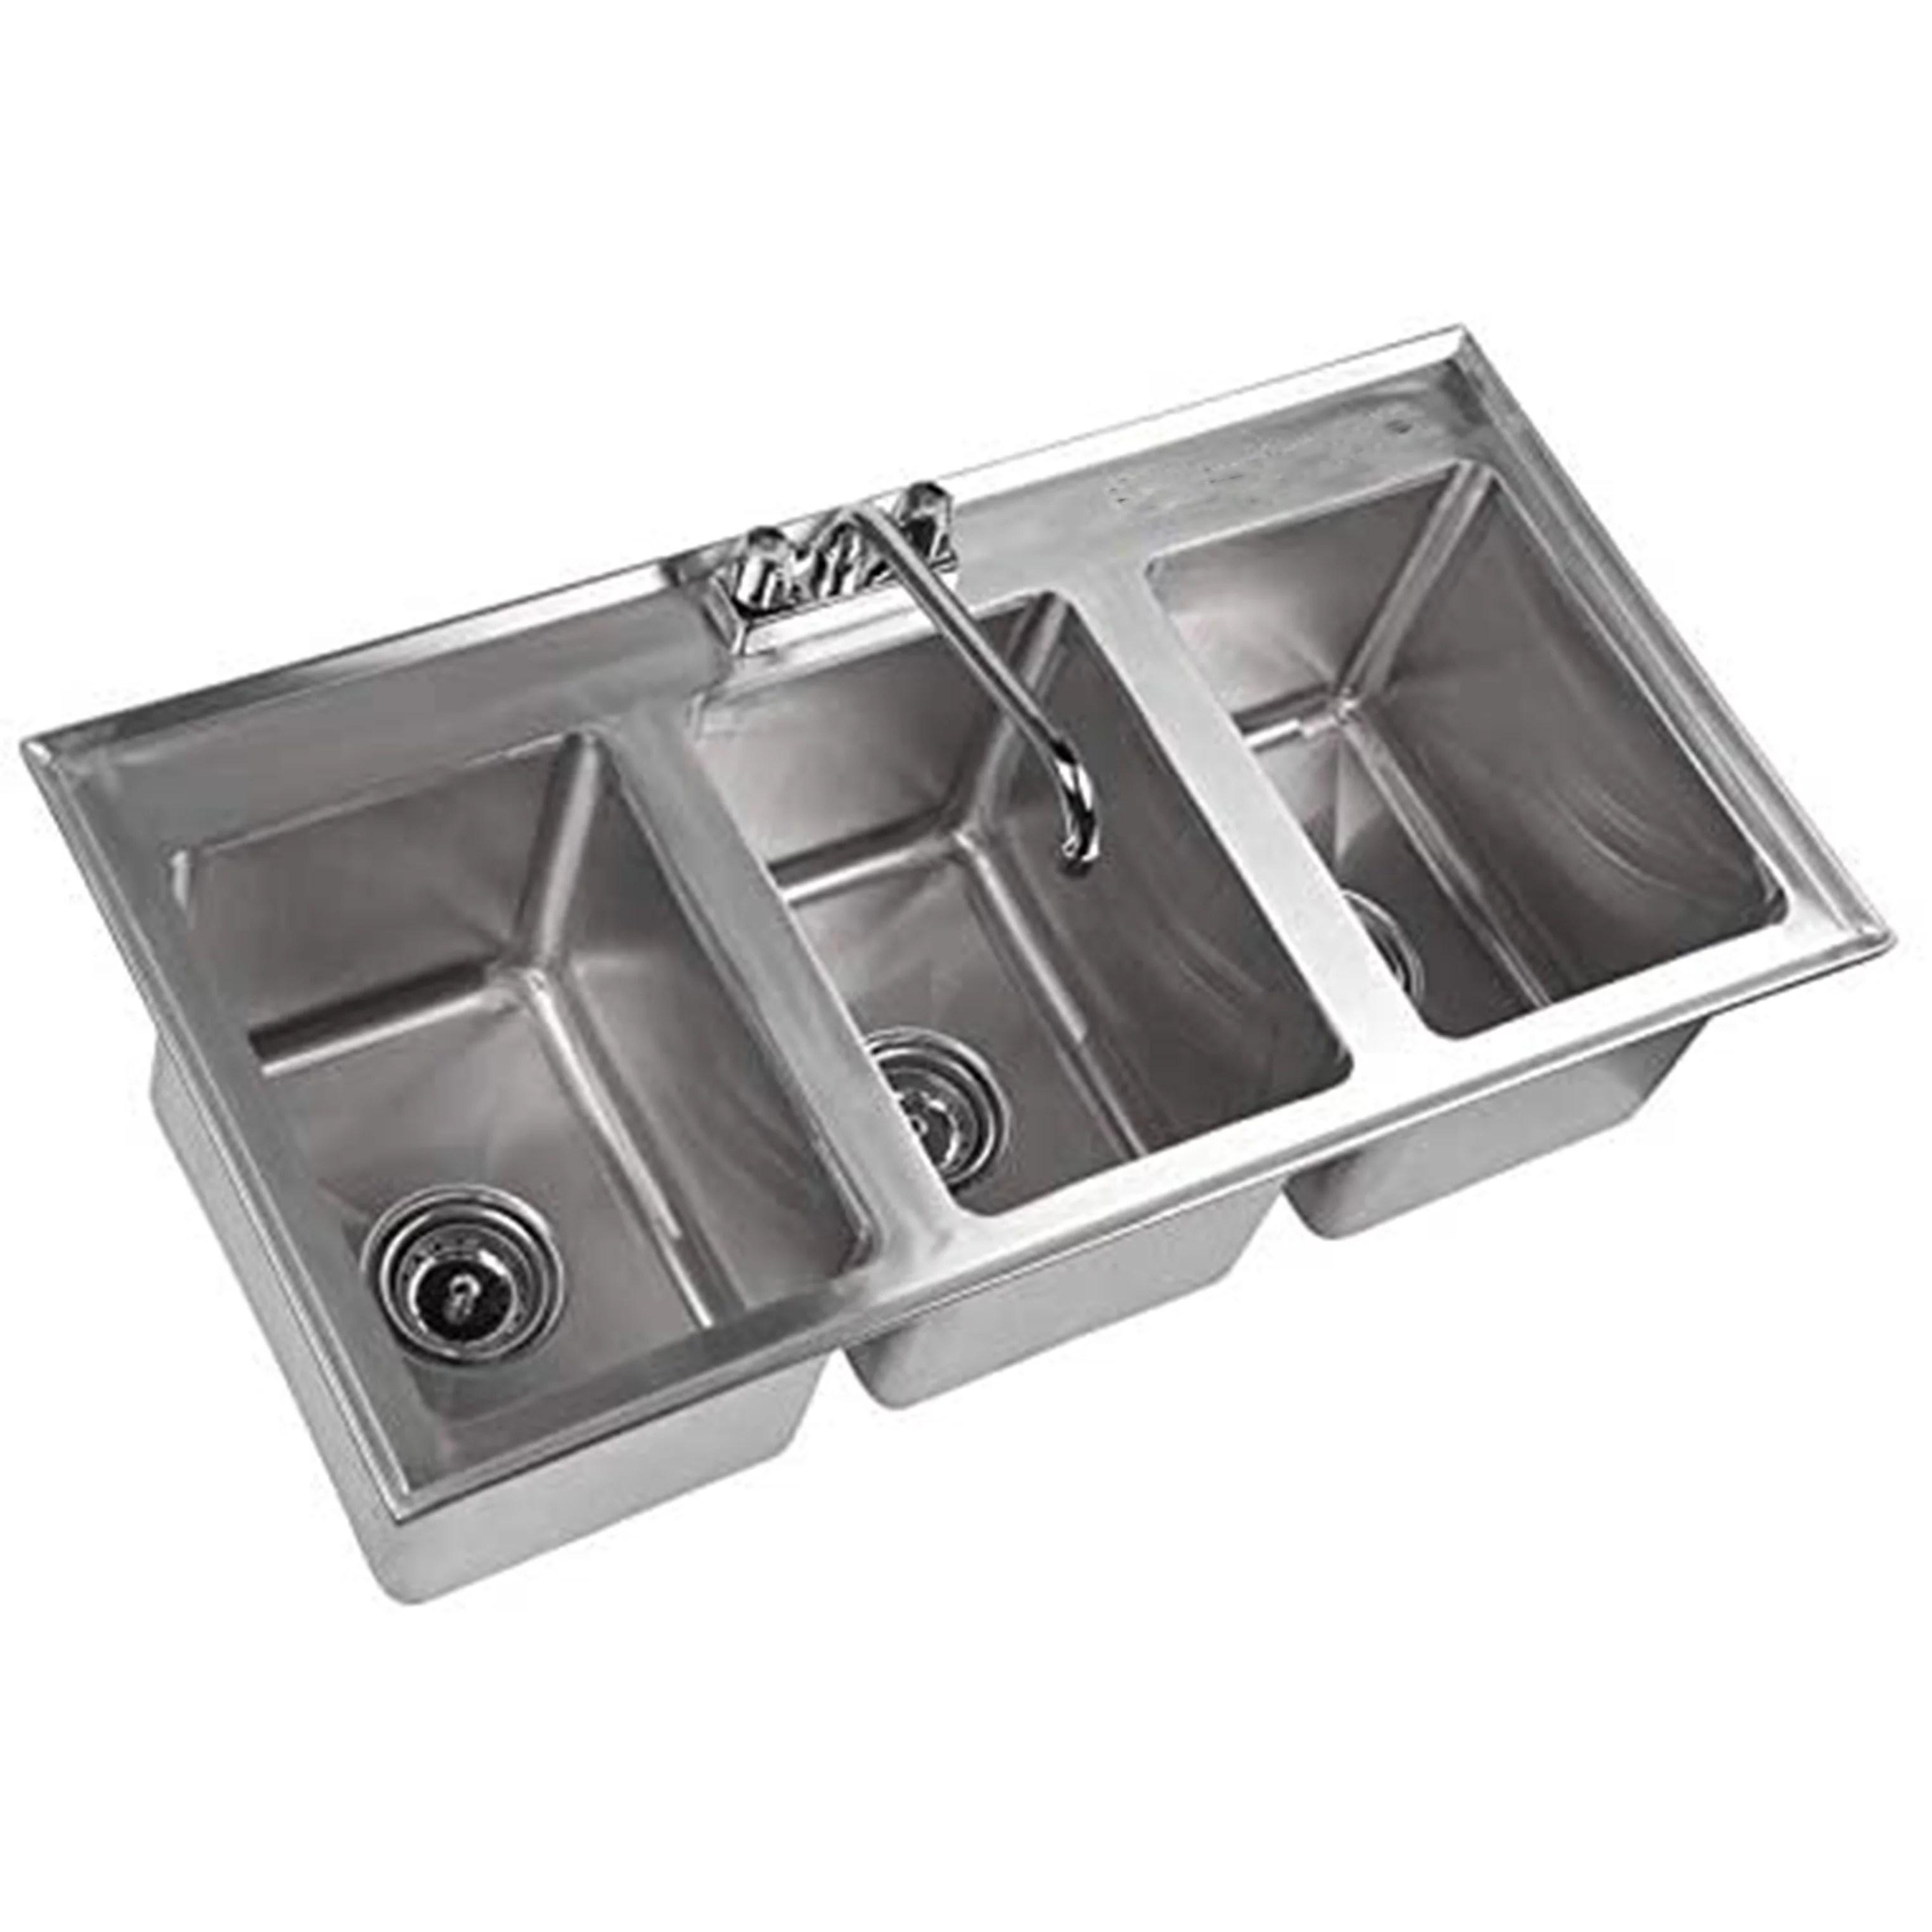 3 compartment 37 l x 19 w stainless steel kitchen drop in sink 10 x 14 x 10 stainless steel 3 compartment drop in sink walmart com